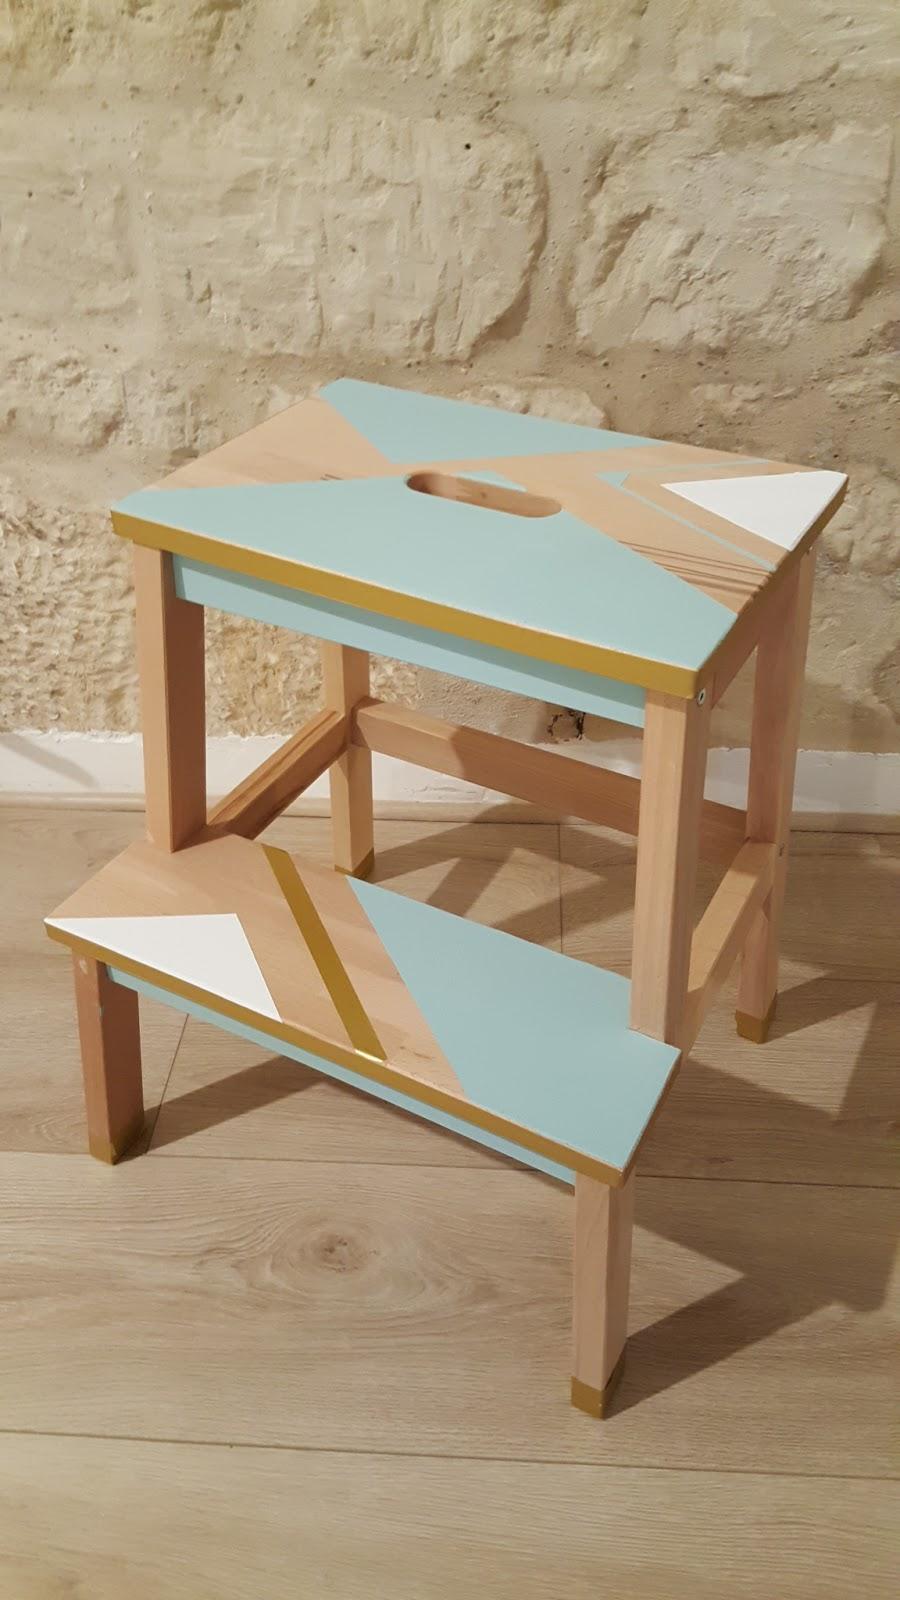 la sourici re diy 2 customiser un marche pied ik a. Black Bedroom Furniture Sets. Home Design Ideas